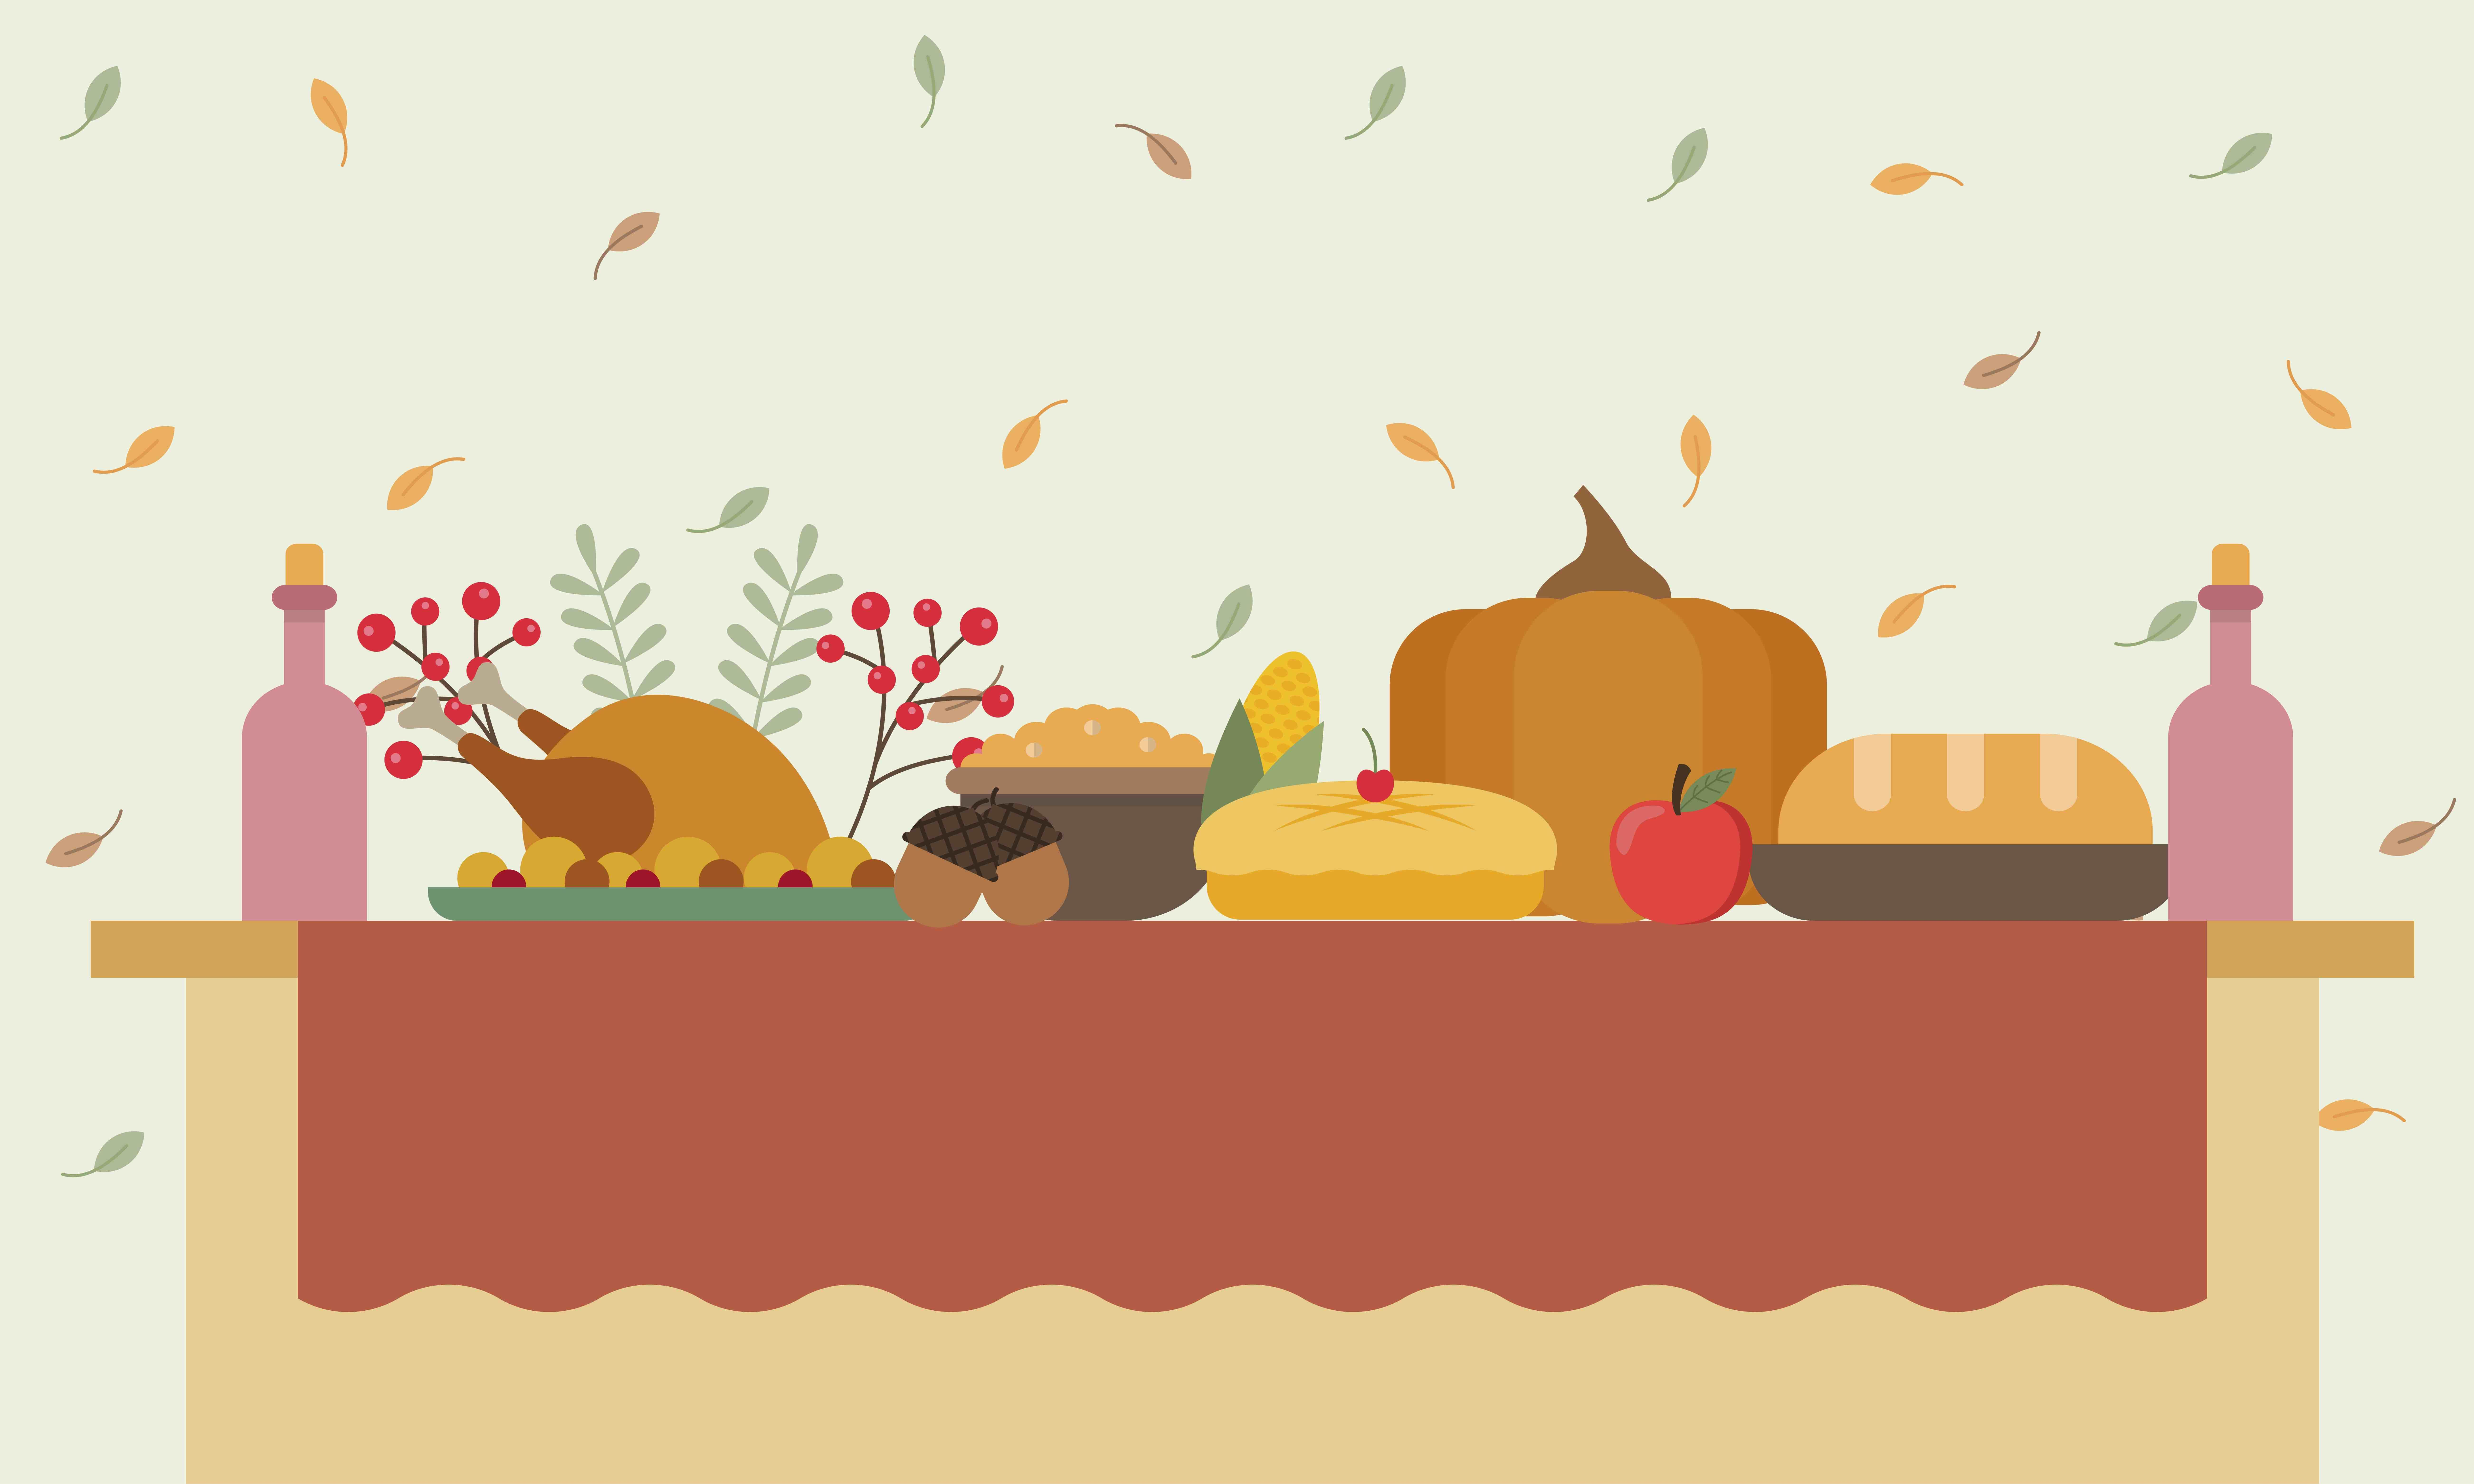 3 Ways to Decolonize Thanksgiving